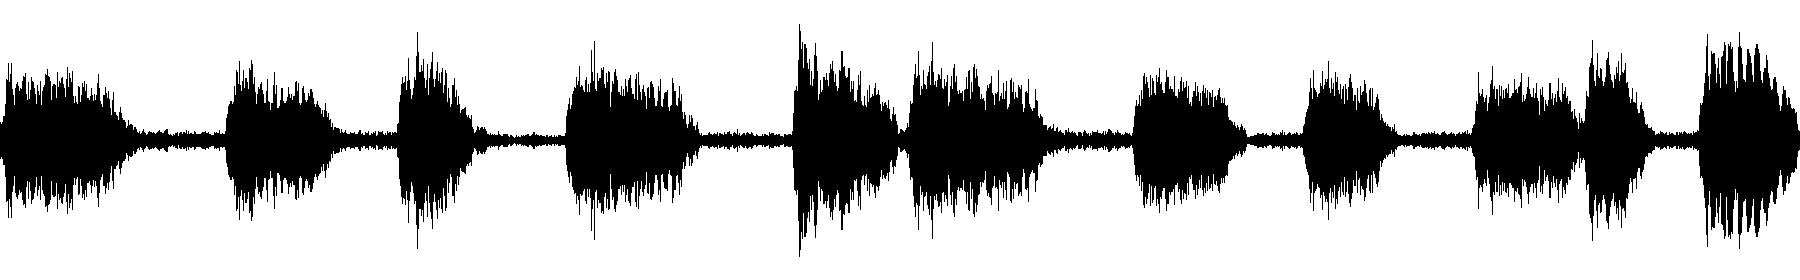 shs ch musicloop 127 organ cm